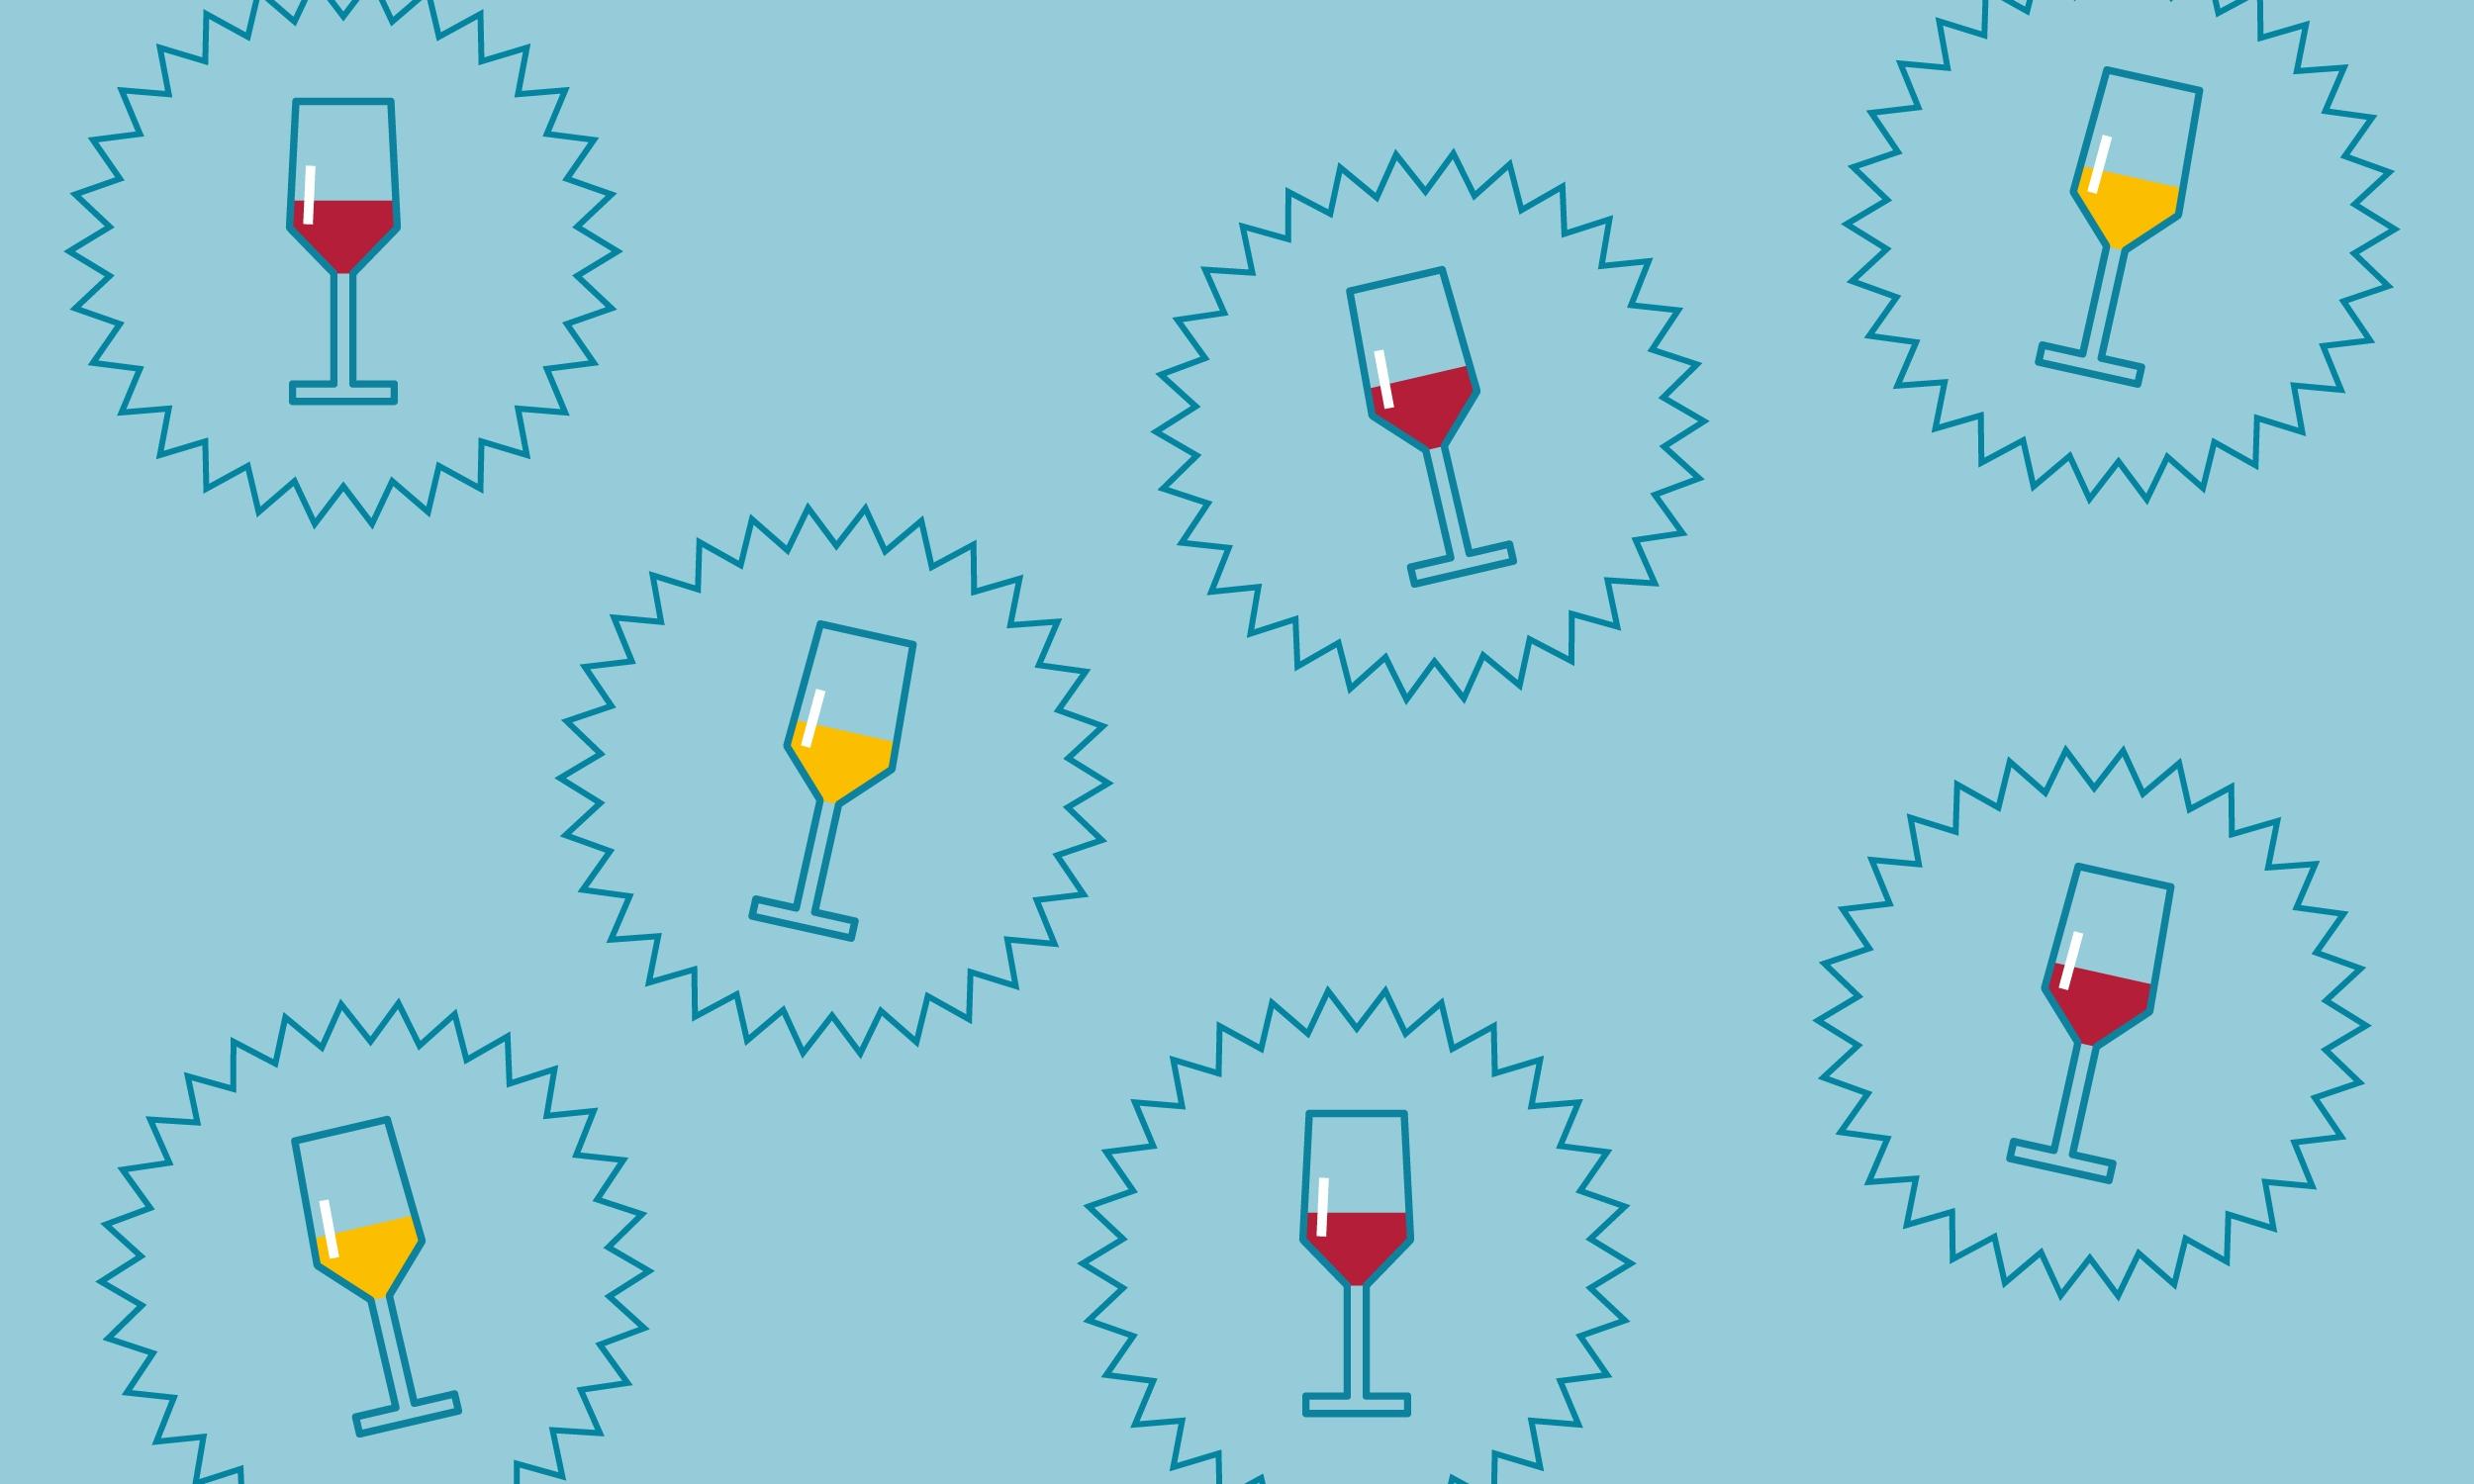 units-in-a-glass-wine.jpg